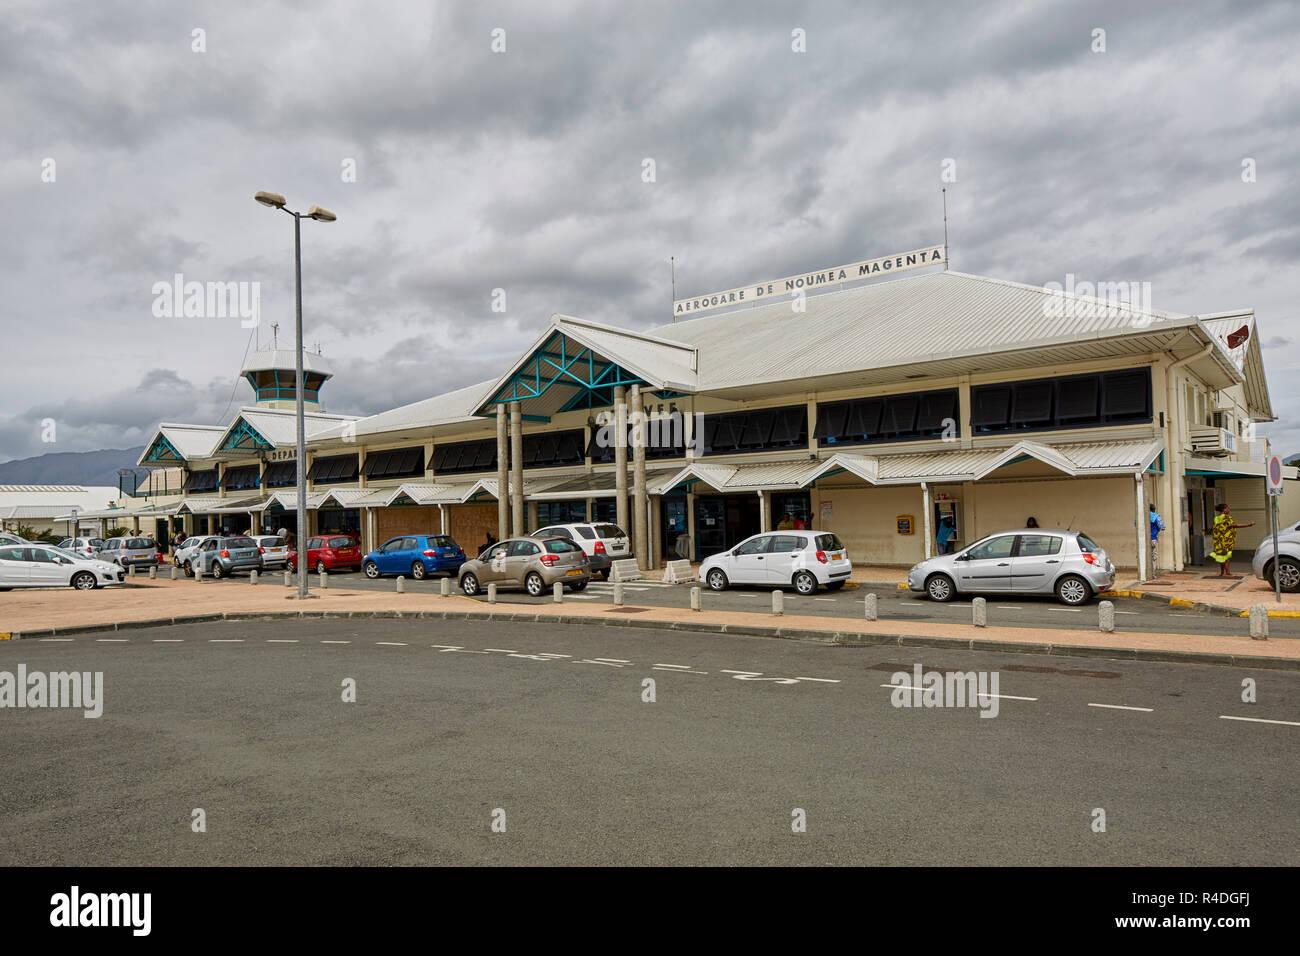 Aeroporto nazionale Aerogare de Noumea Magenta airport a Noumea, Nuova Caledonia Immagini Stock